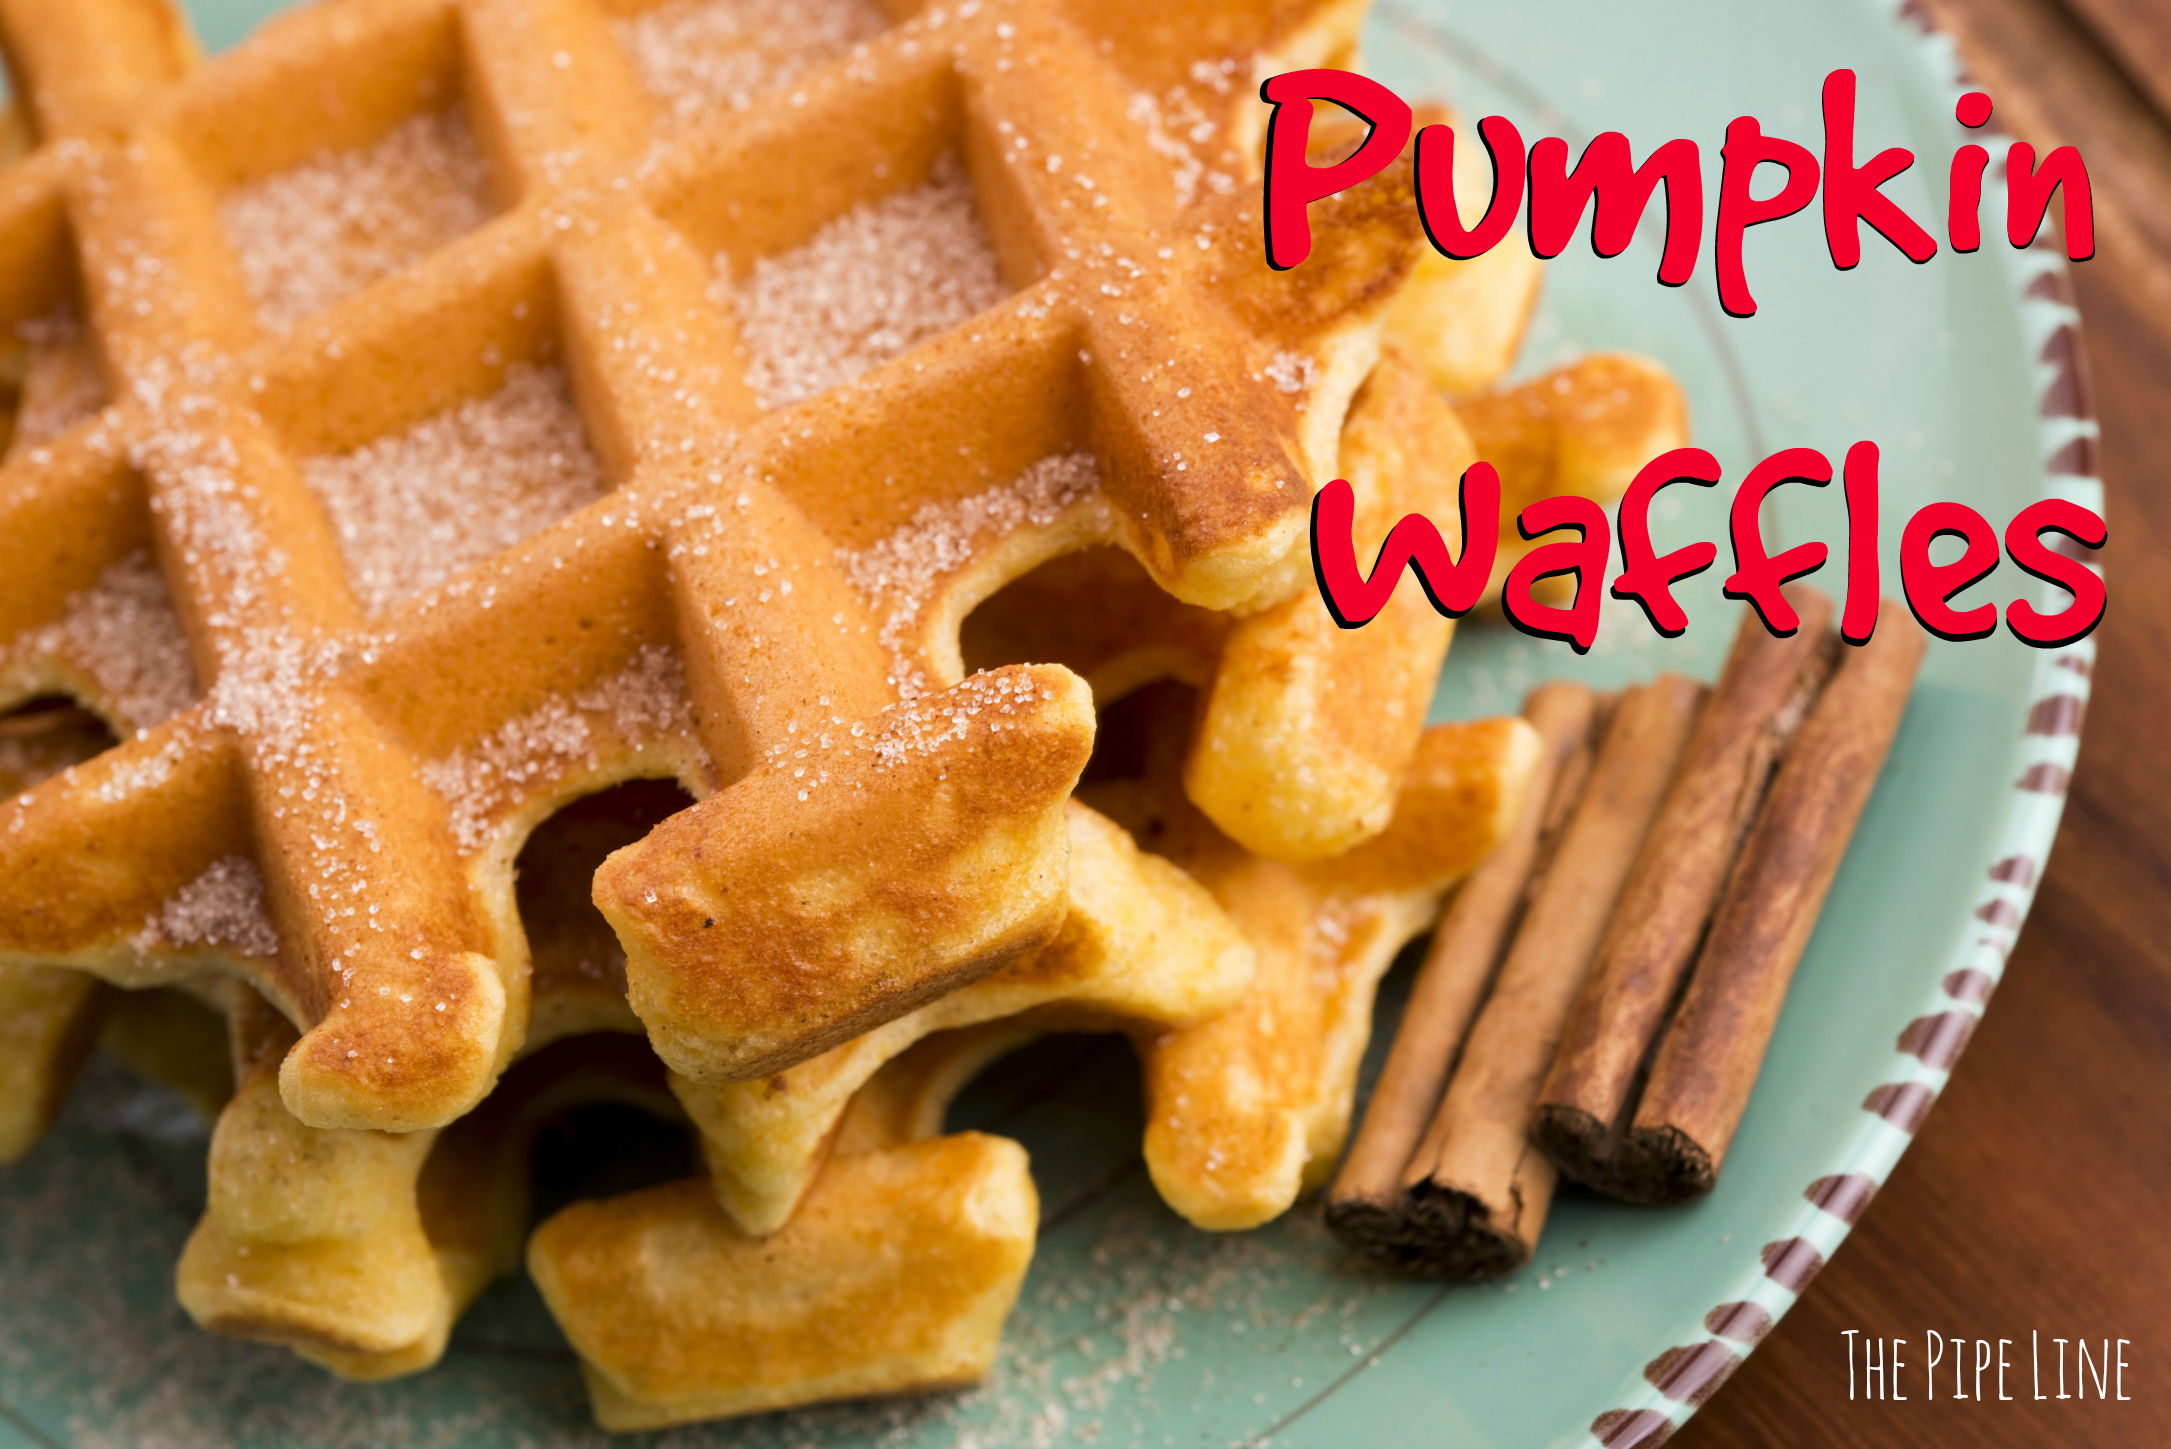 Piping Rock - The Pipe Line Blog - Recipe - Pumpkin Waffles - Gluten Free - Vegan